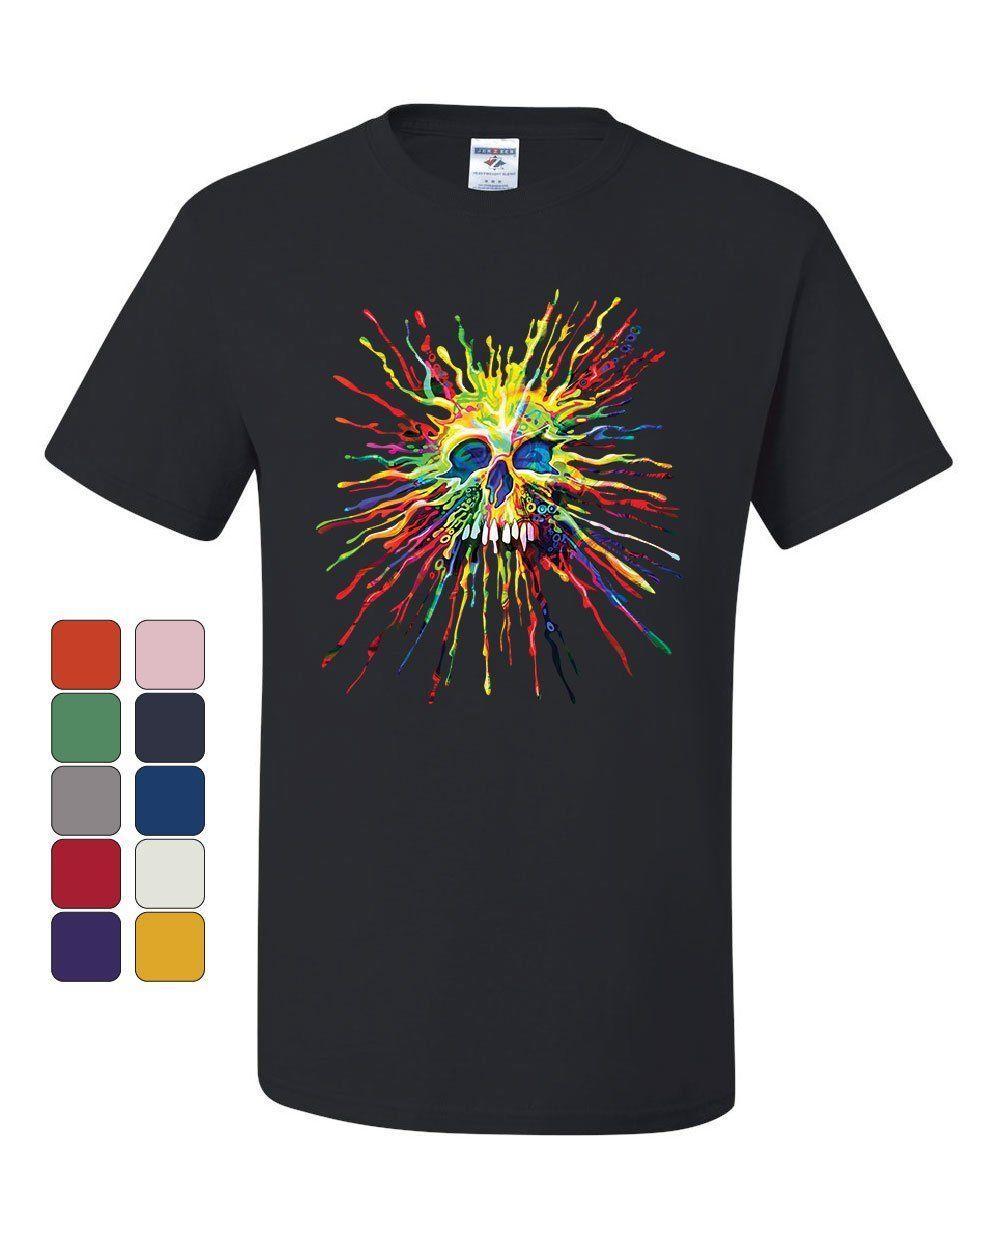 5284d118 Paint Splatter Skull T Shirt Multicolor Art Crazy Melting Drip Tee Shirt  Custom T Shirt Logo Text Photo Mens Womens T Shirt Men Awesome Cheap T  Shirts ...